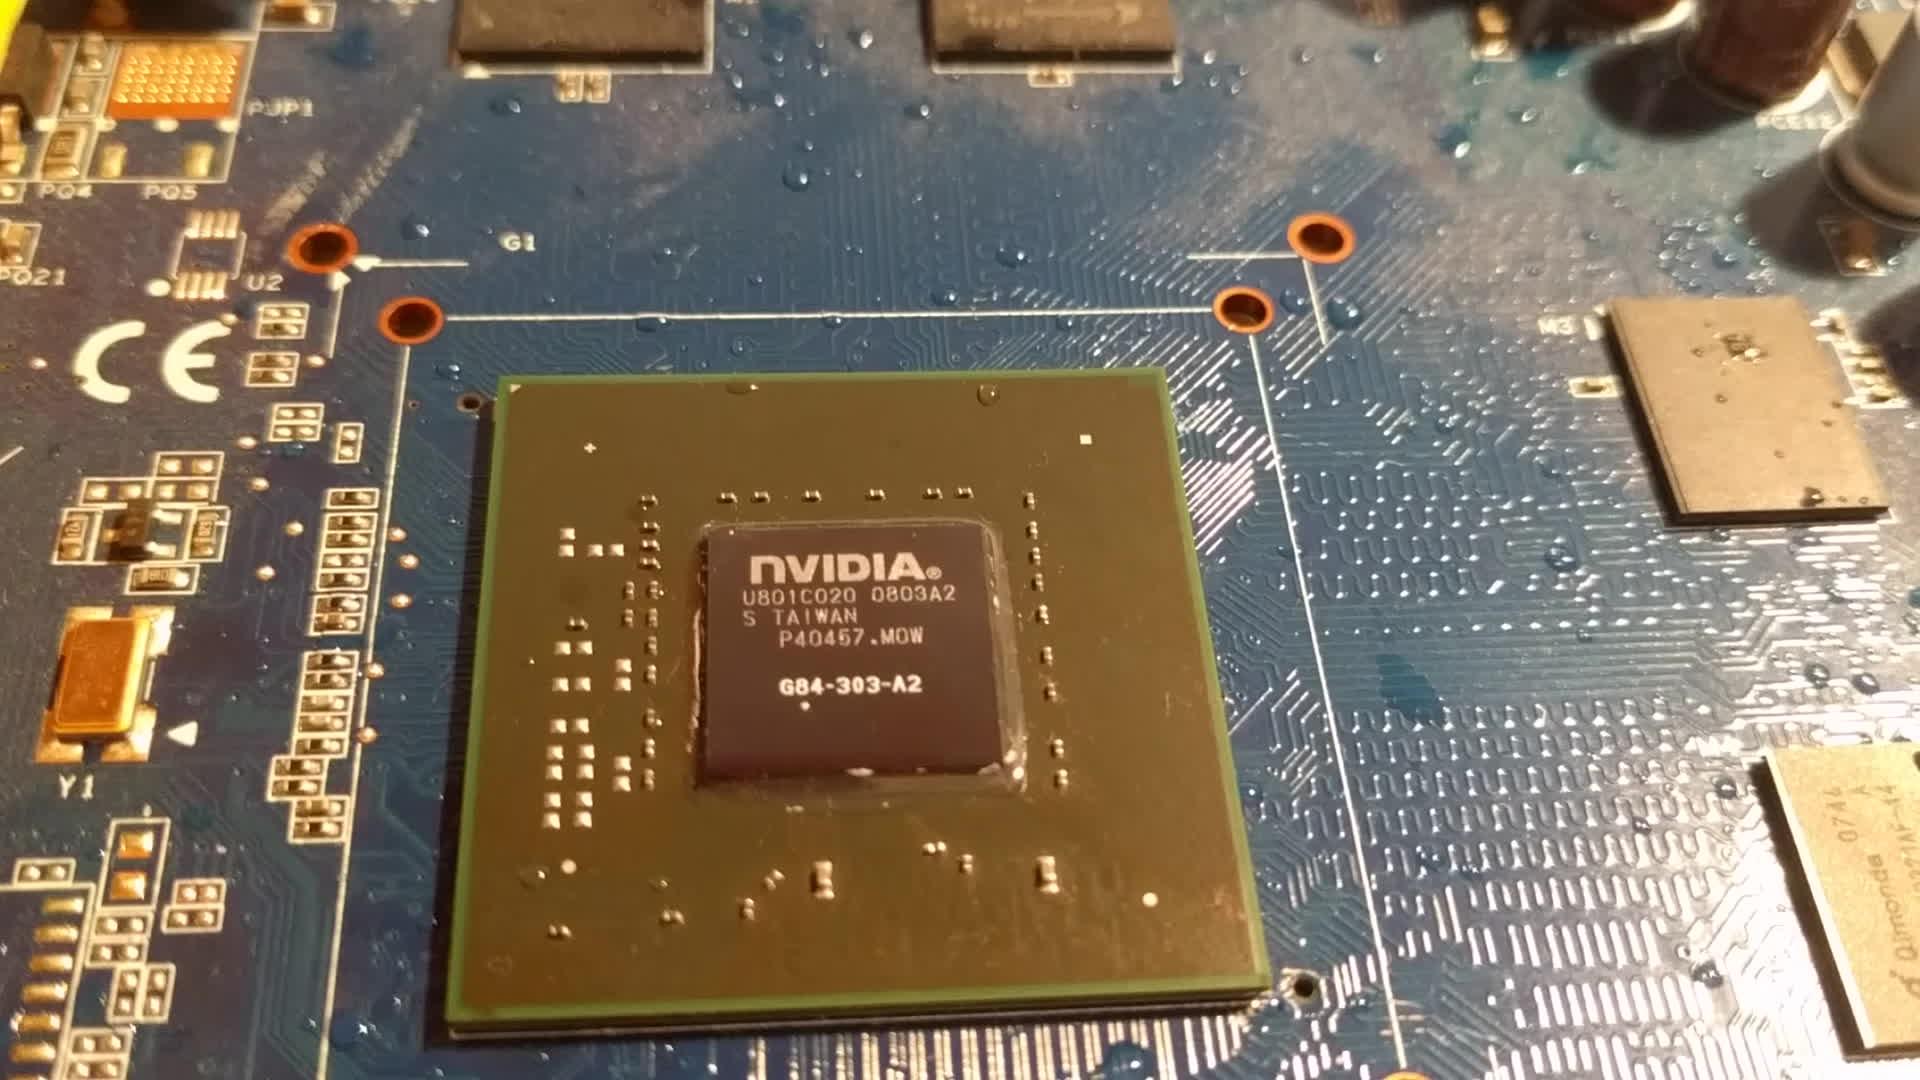 ayymd, dank, novideo, How to properly use a Novideo GPU GIFs